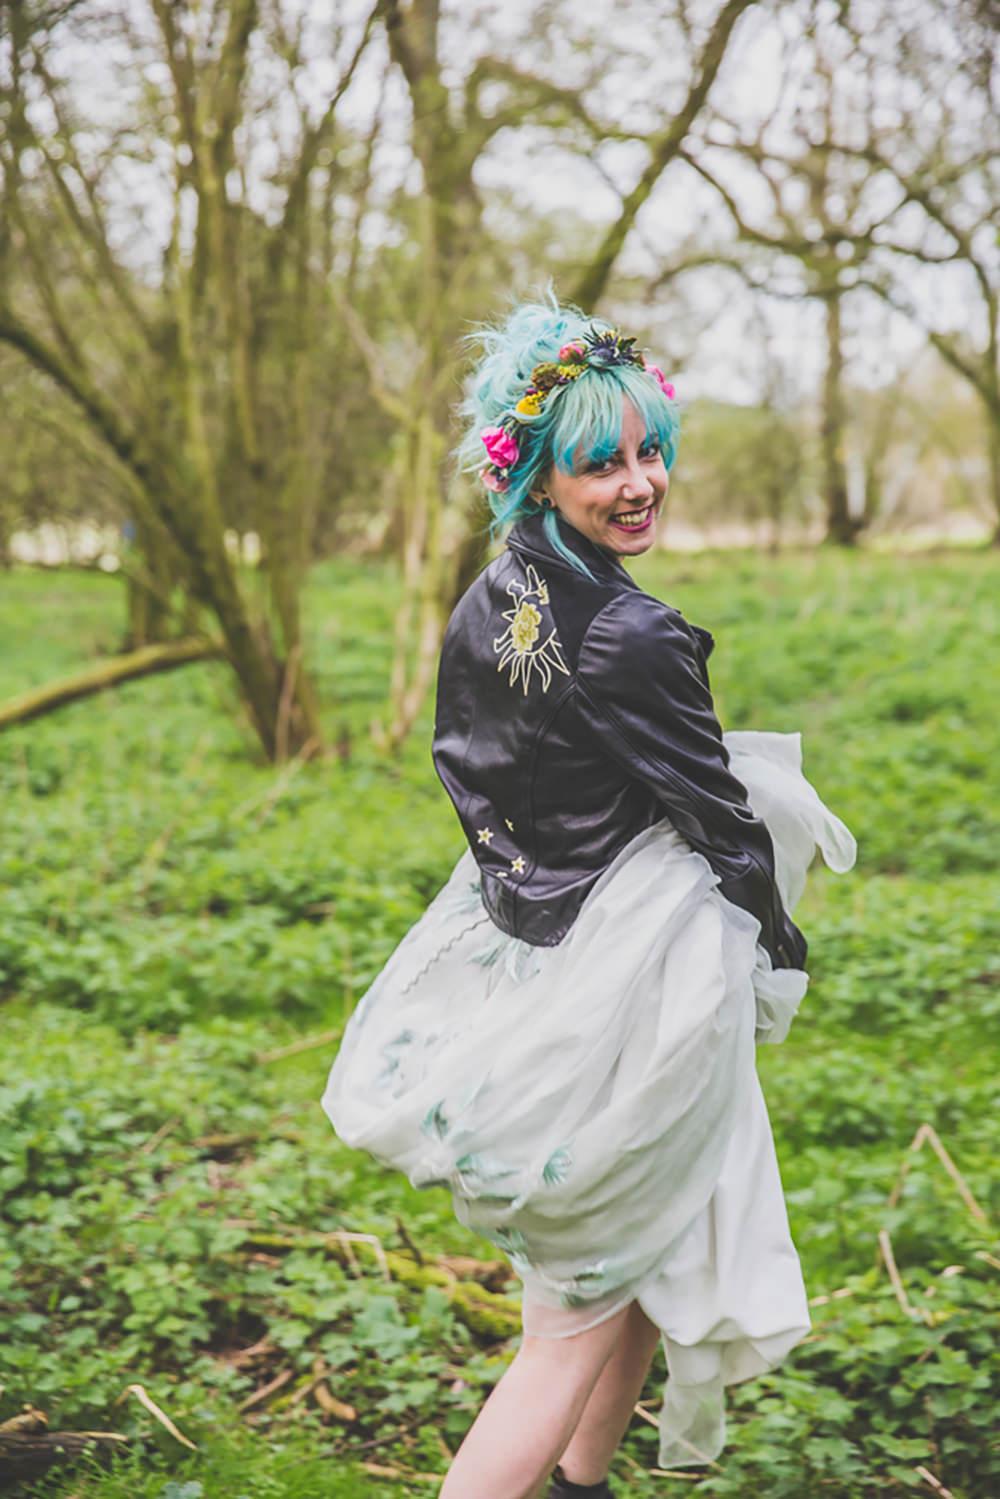 Dress Gown Bride Bridal Painted Leather Jacket Rainbow Alternative Woodland Wedding Ideas Nicki Shea Photography